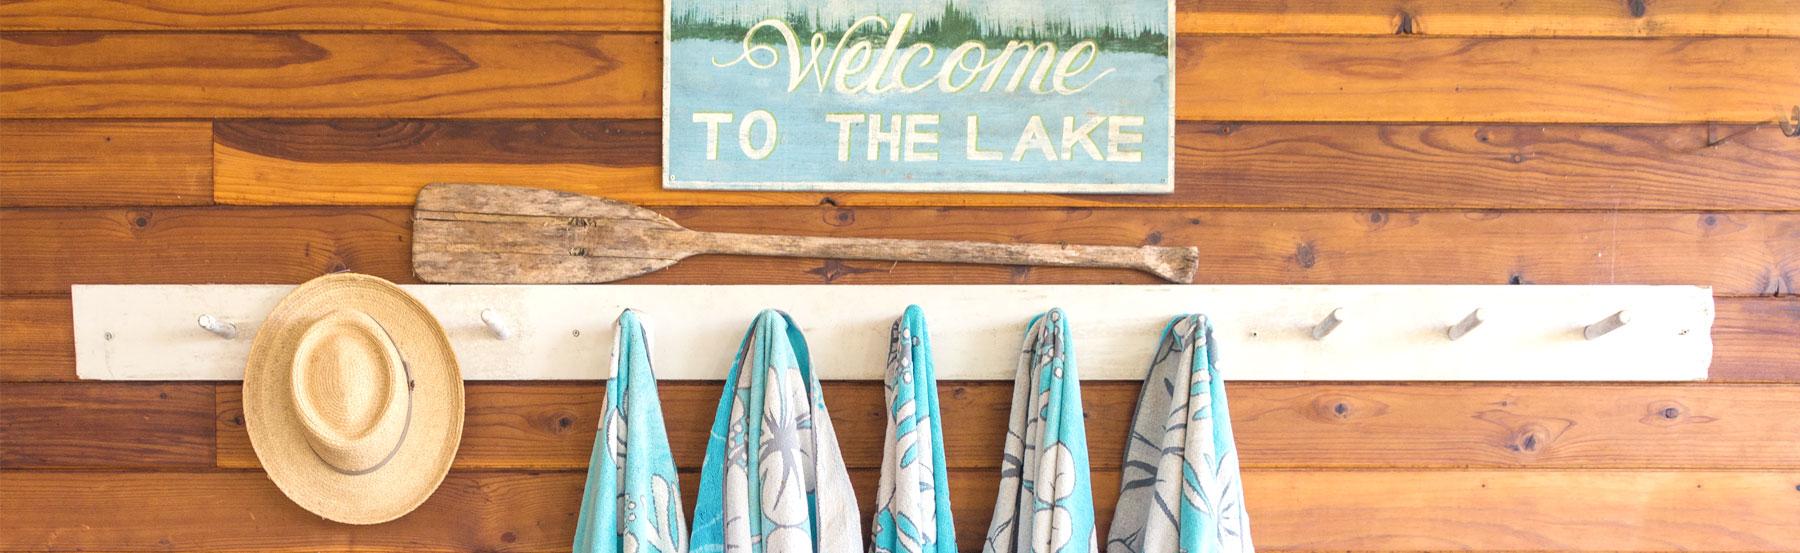 WEBIMAGES: Sept2019-Welcome-Lake.jpg